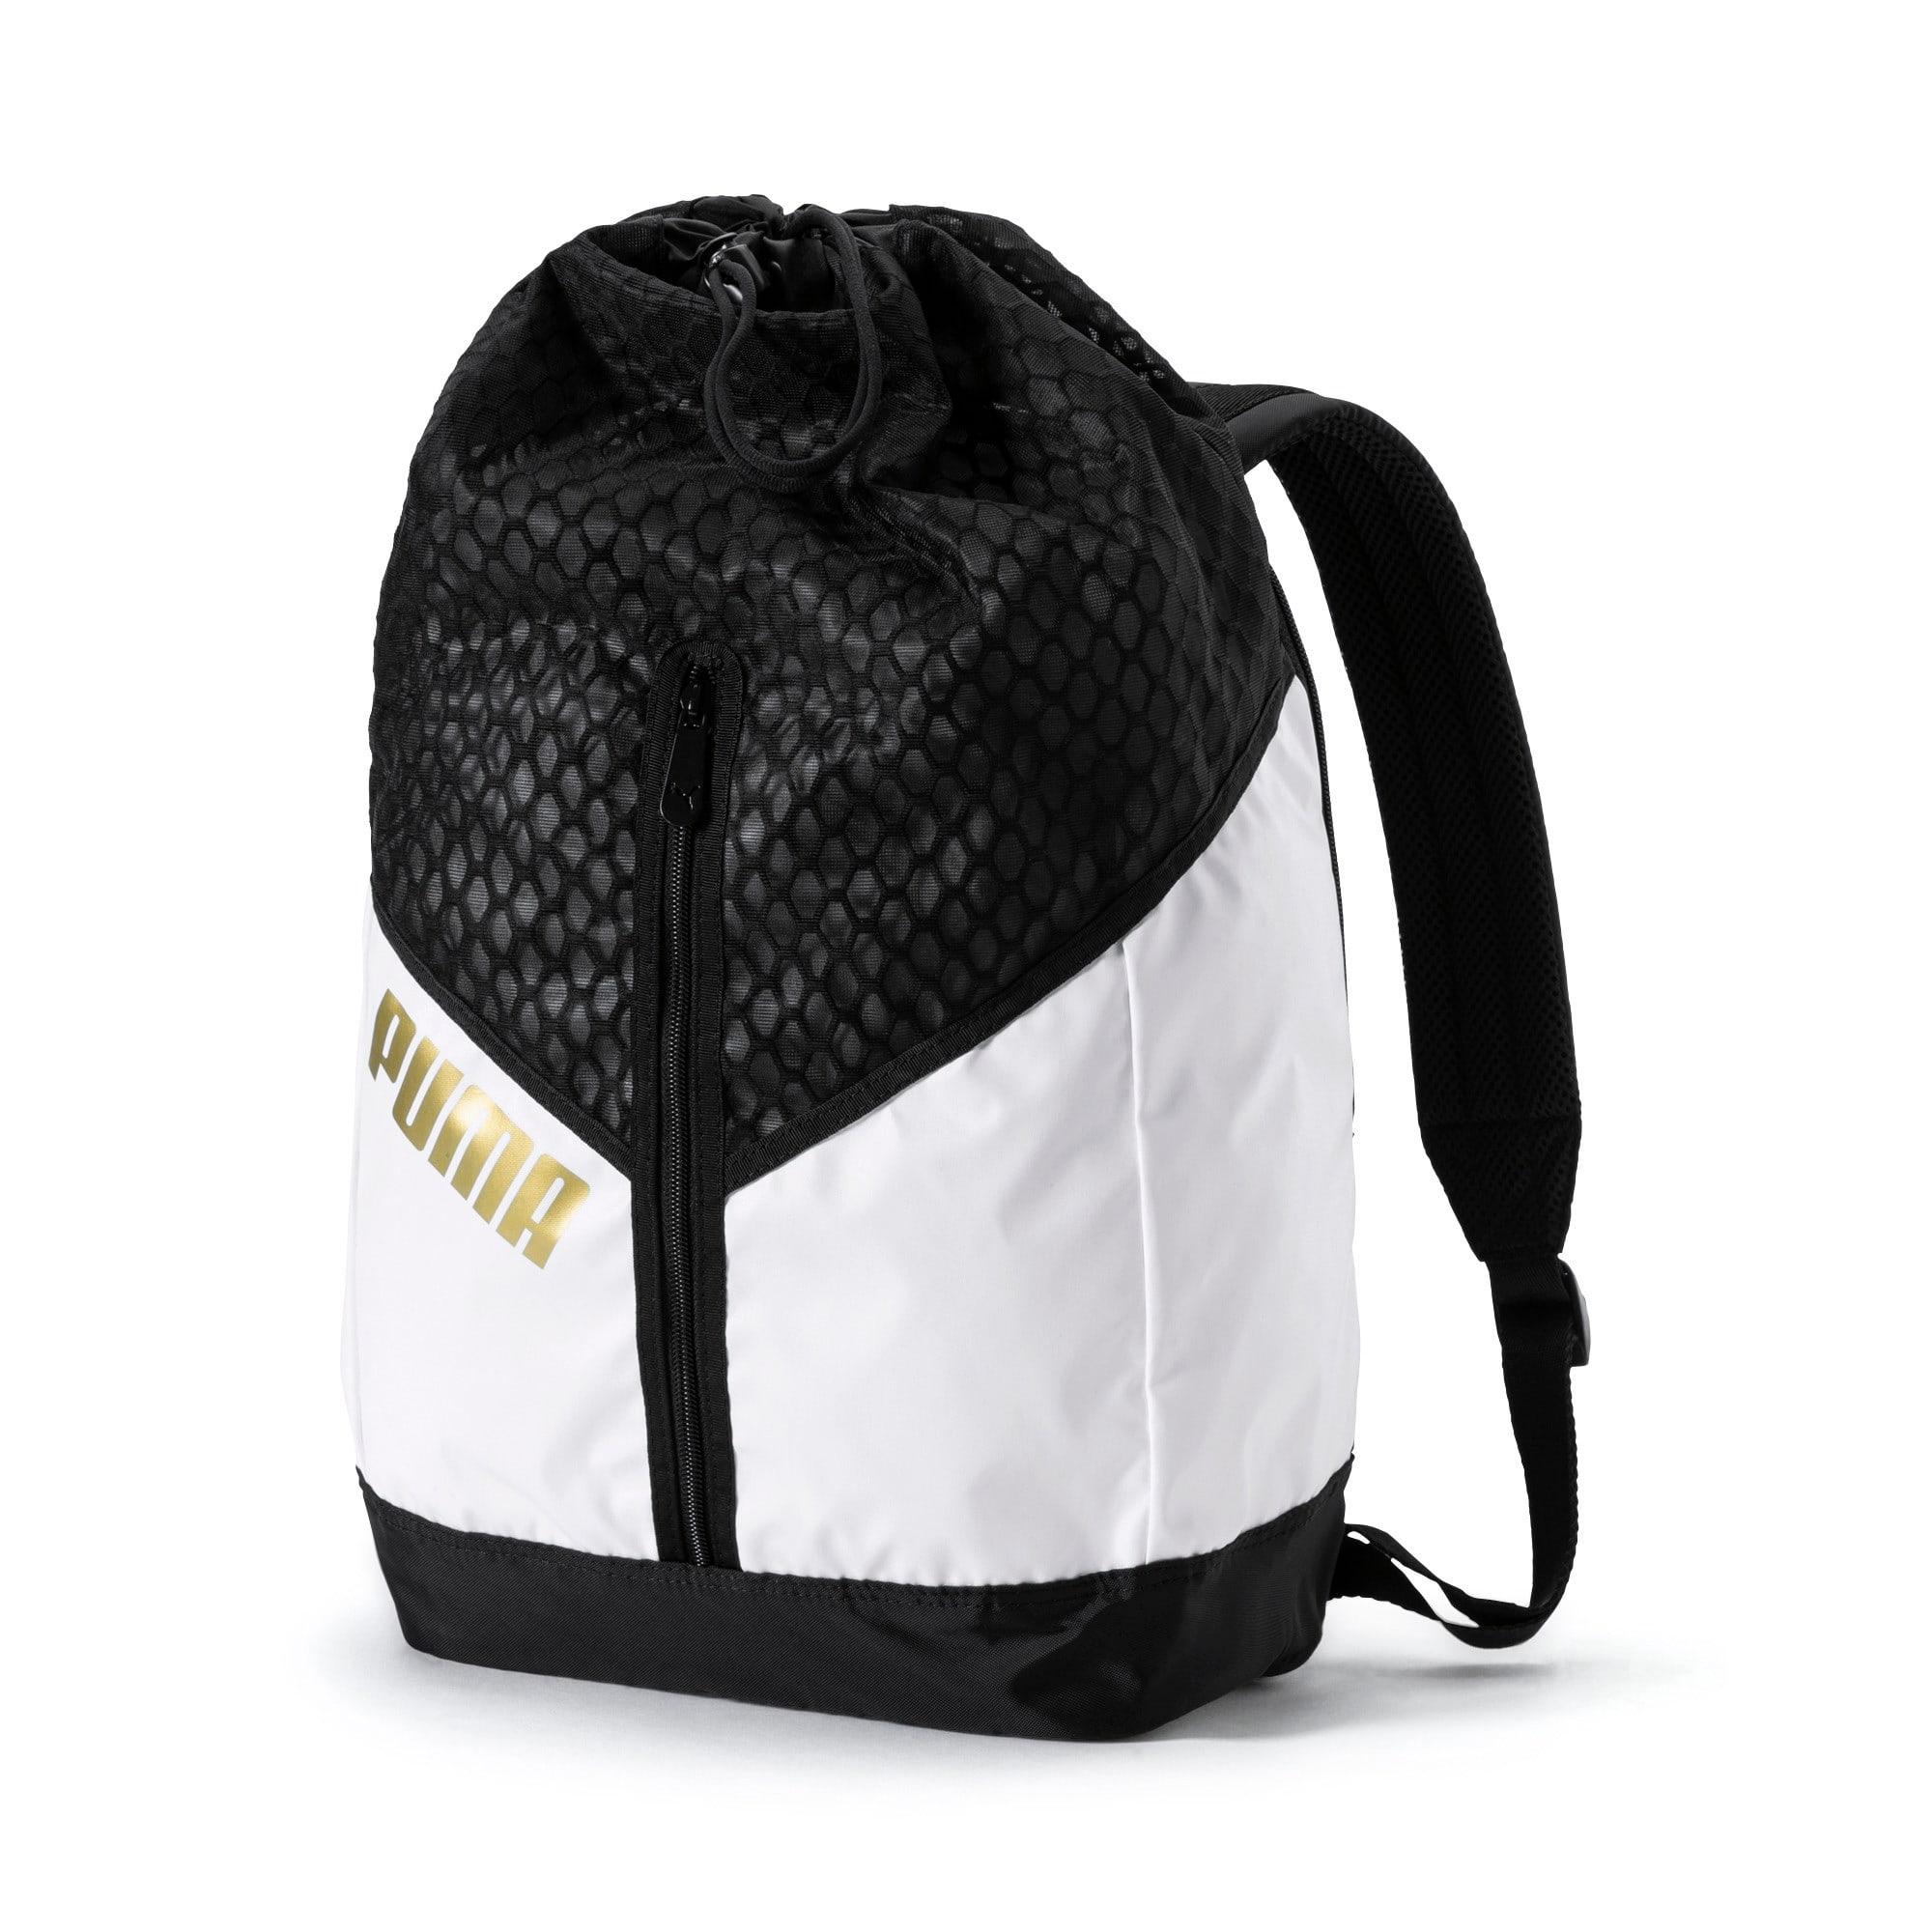 Thumbnail 1 of Ambition Gold Women's Backpack, Puma White-Puma Black, medium